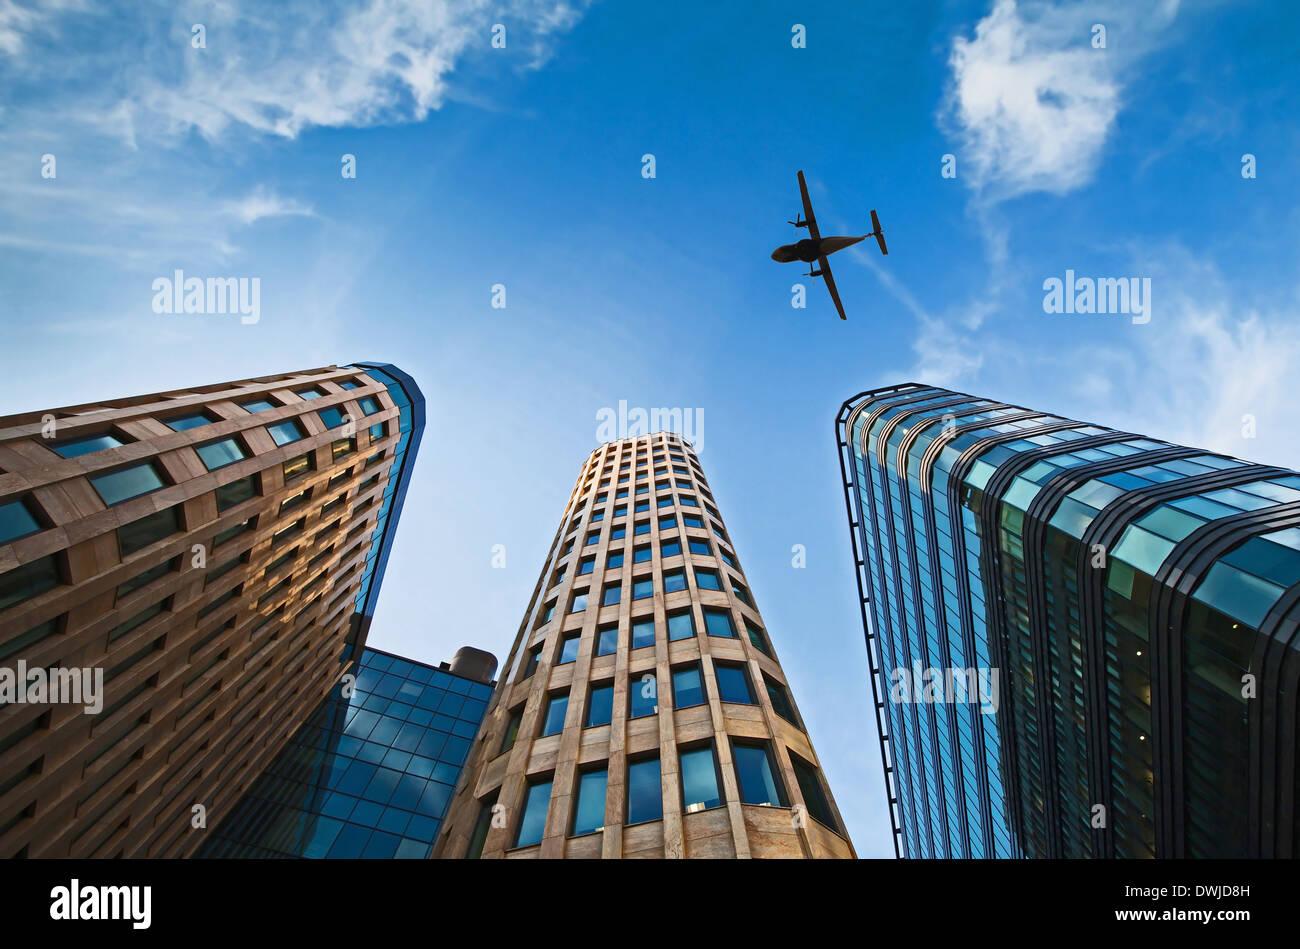 Flugzeug über Bürogebäude Stockbild